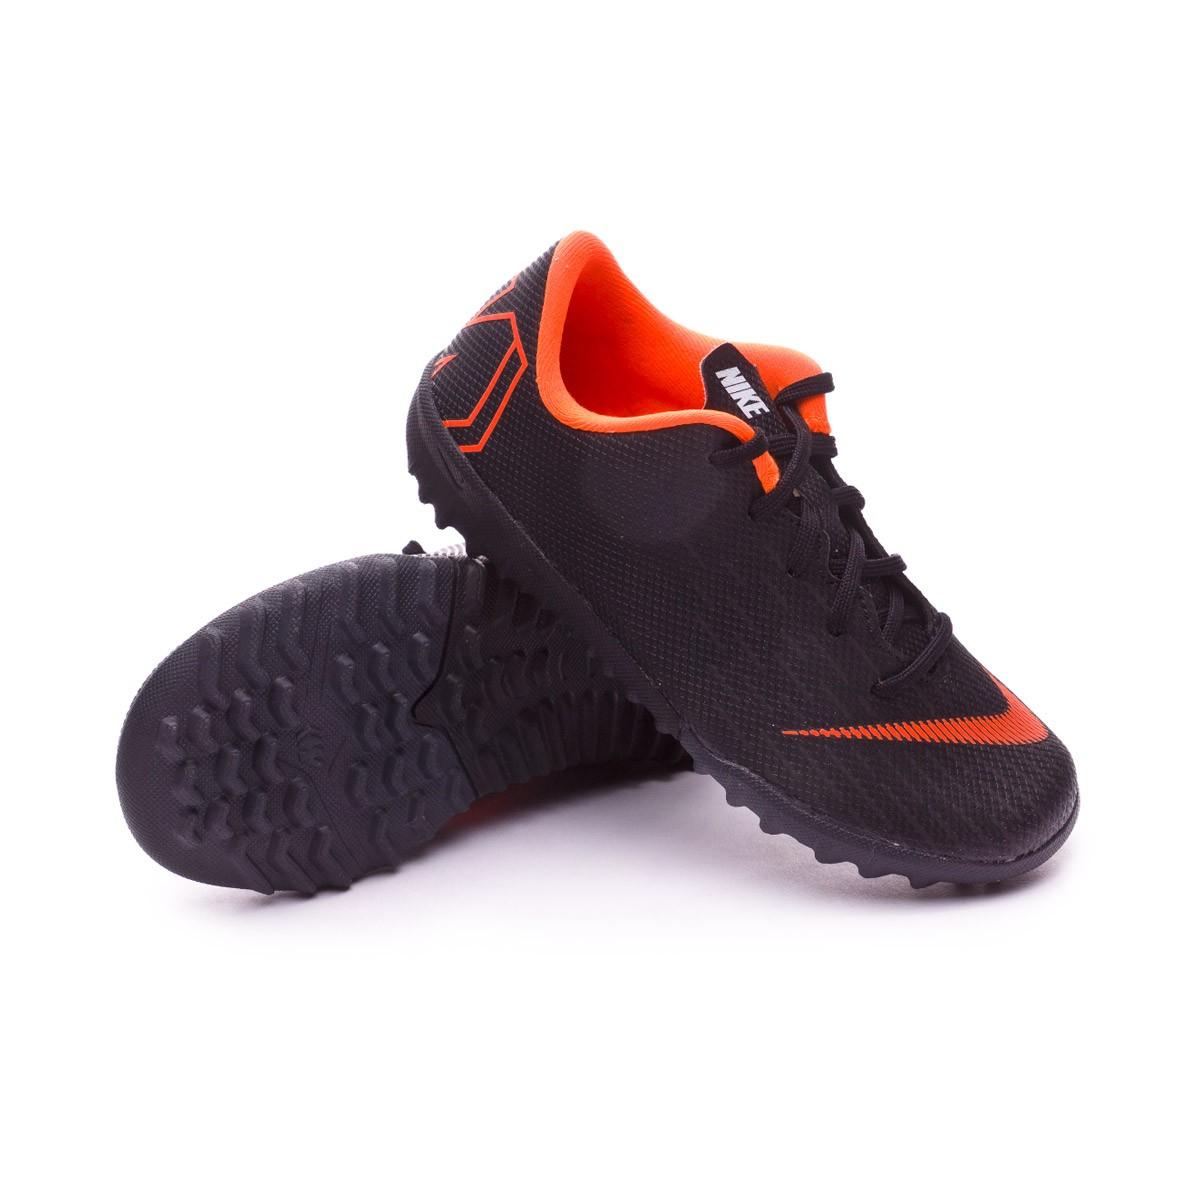 245c0270a069 Football Boot Nike Kids Mercurial VaporX XII Academy PS Turf Black ...